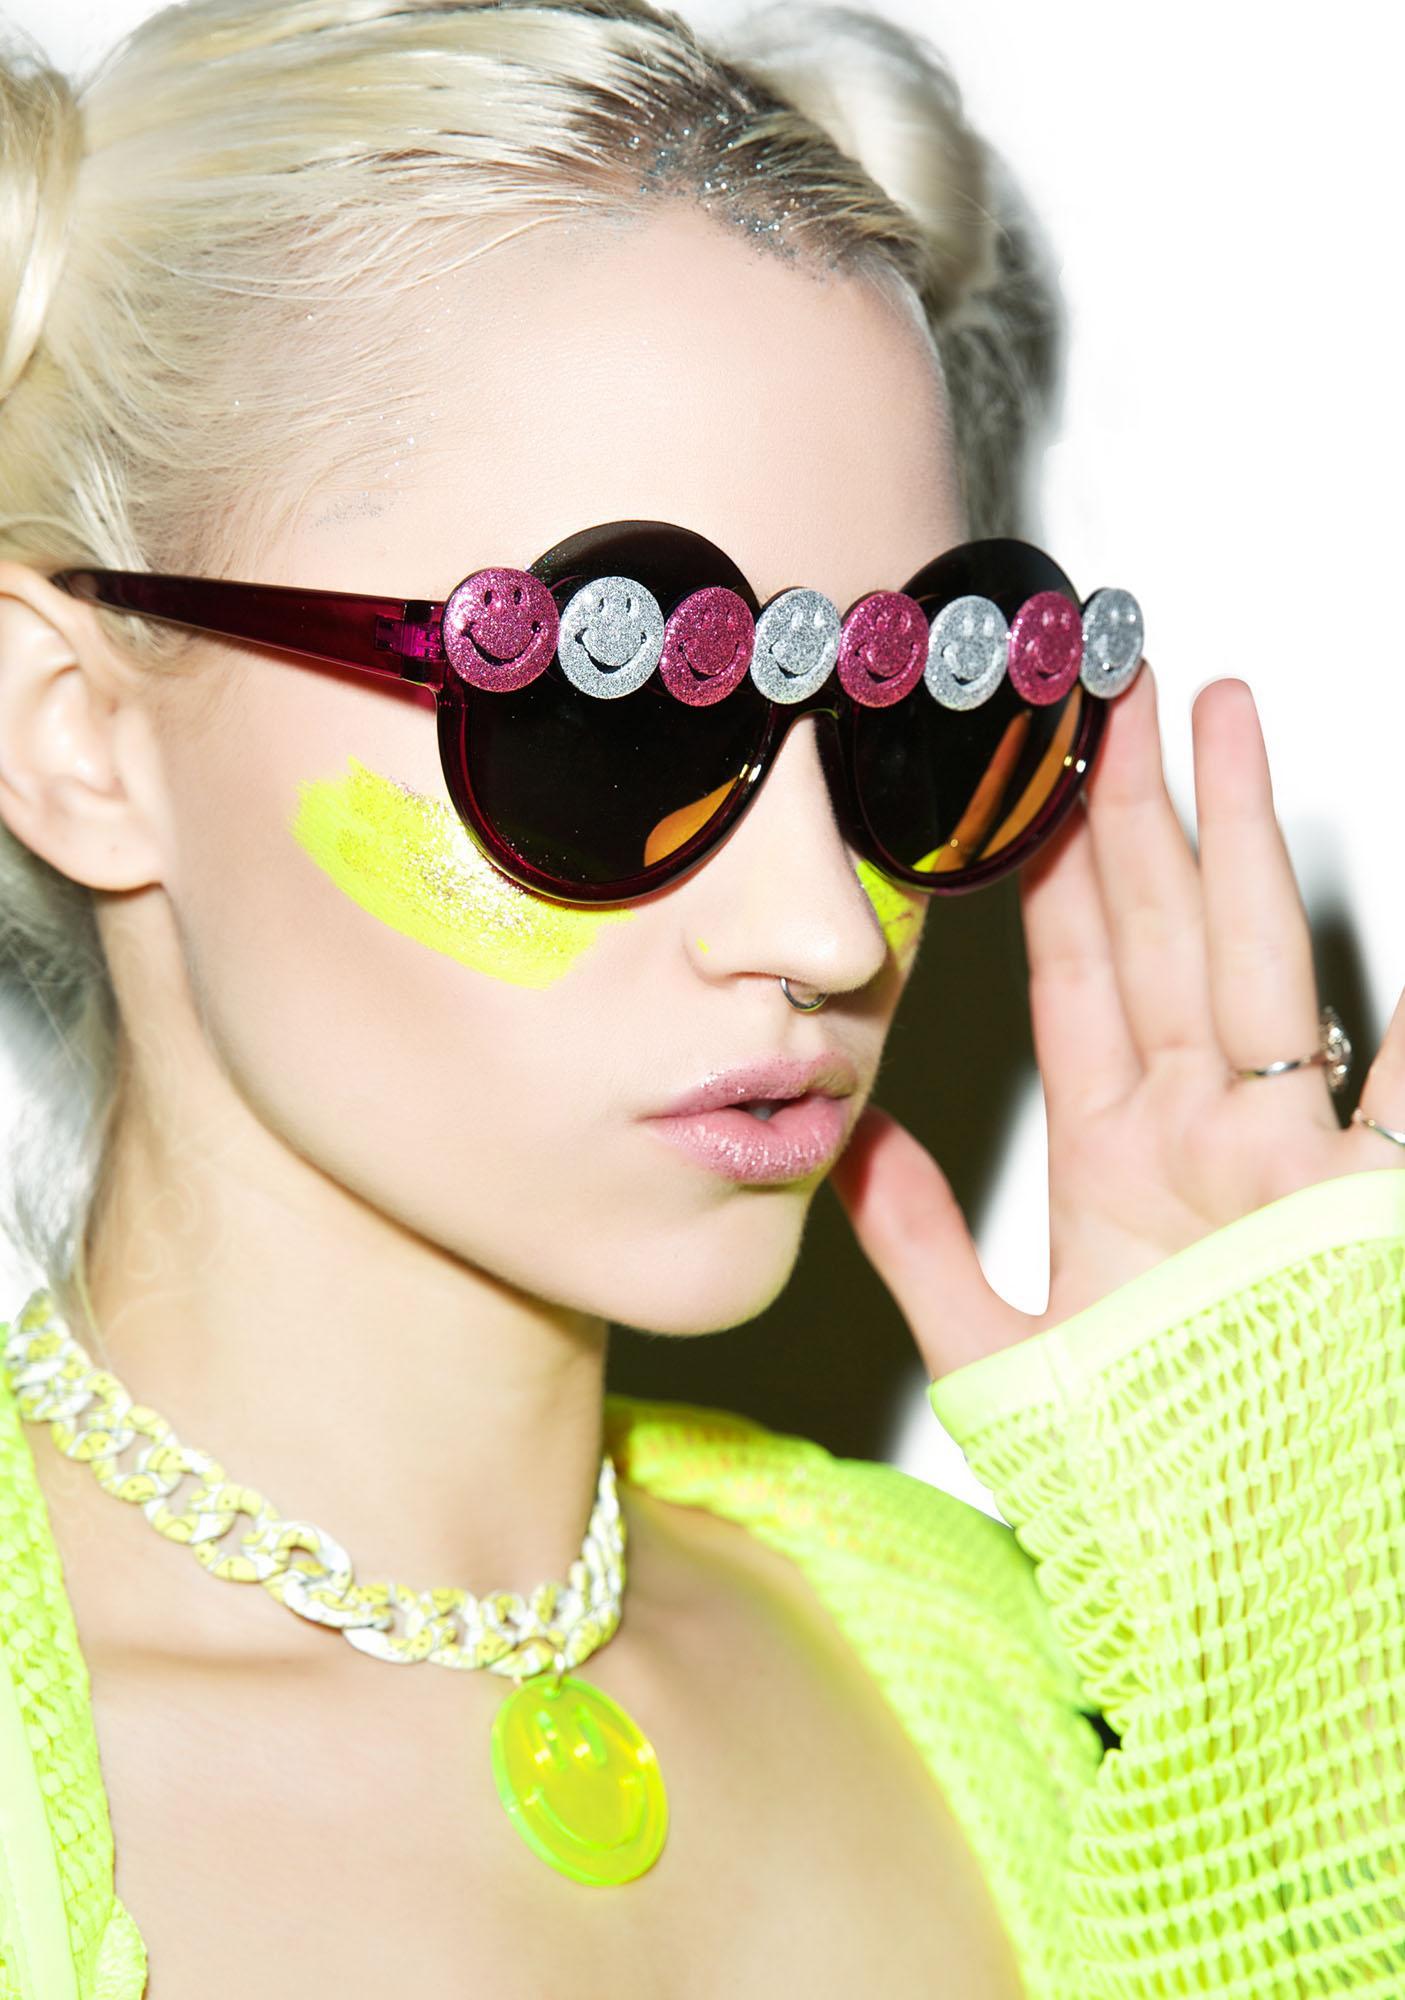 Gasoline Glamour Smiley Gurl Peekaboo Sunglasses